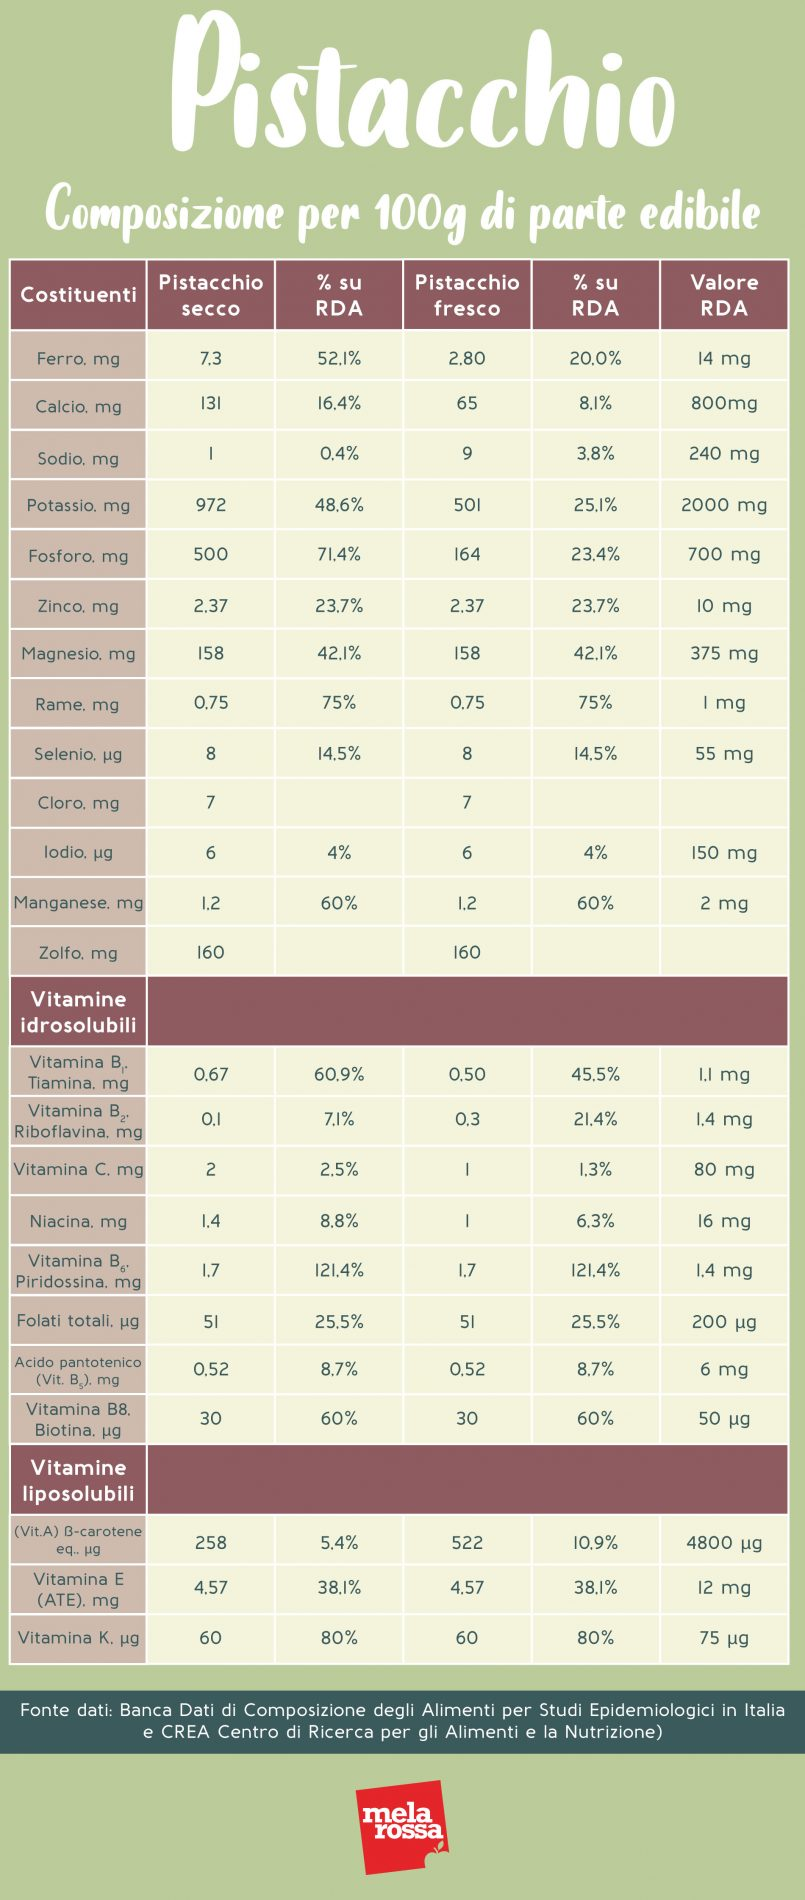 pistacho: valores nutricionales